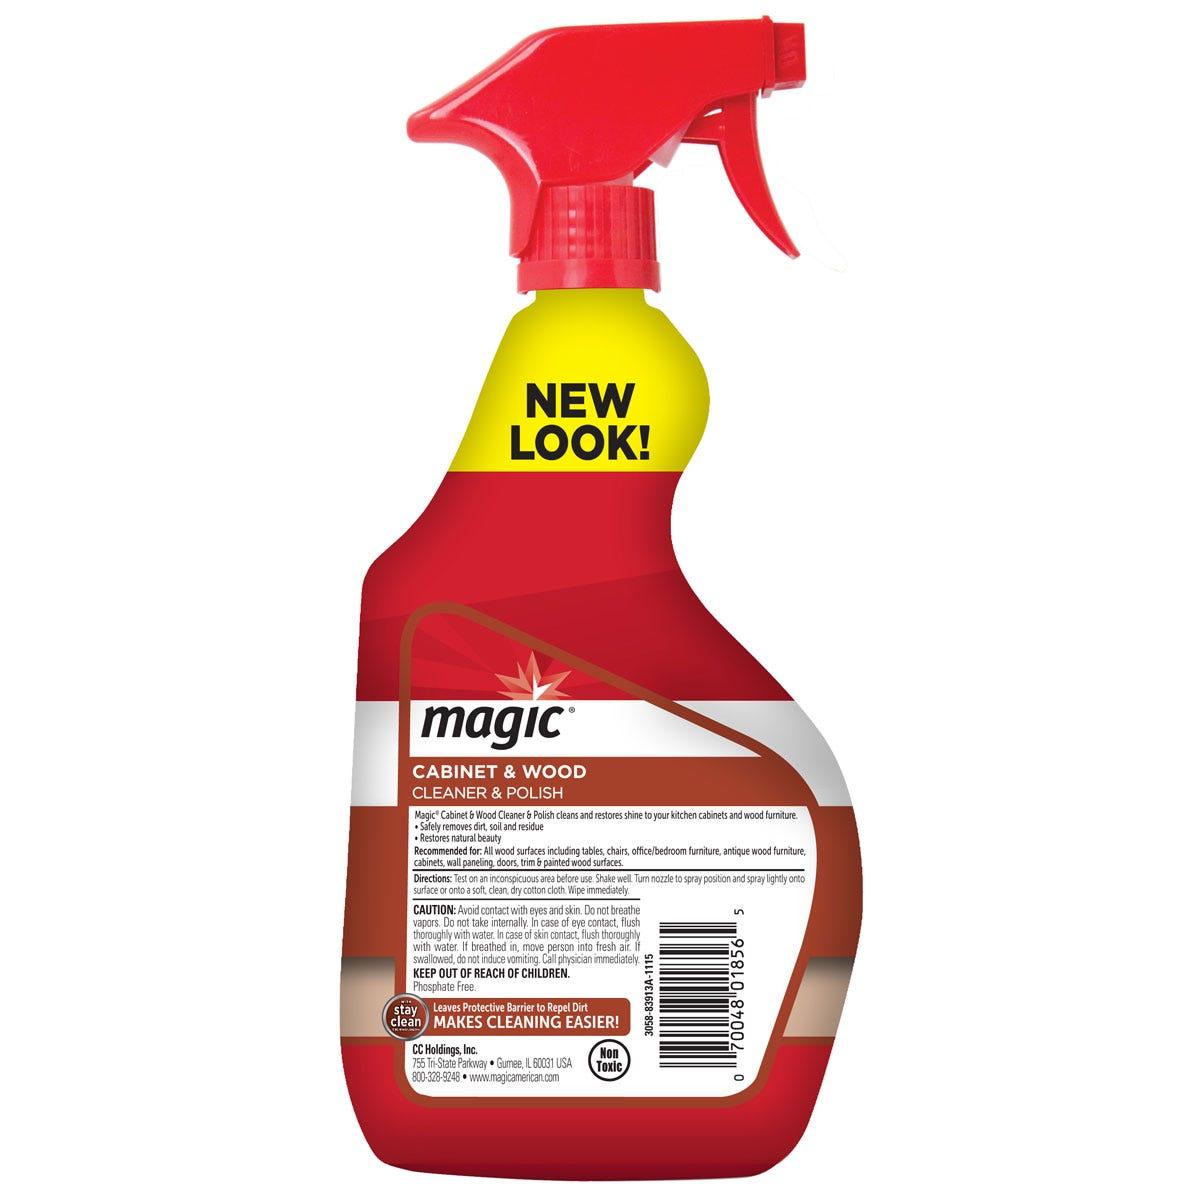 https://googone.com/media/catalog/product/m/a/magic-cabinet-cleaner-spray_back.jpg